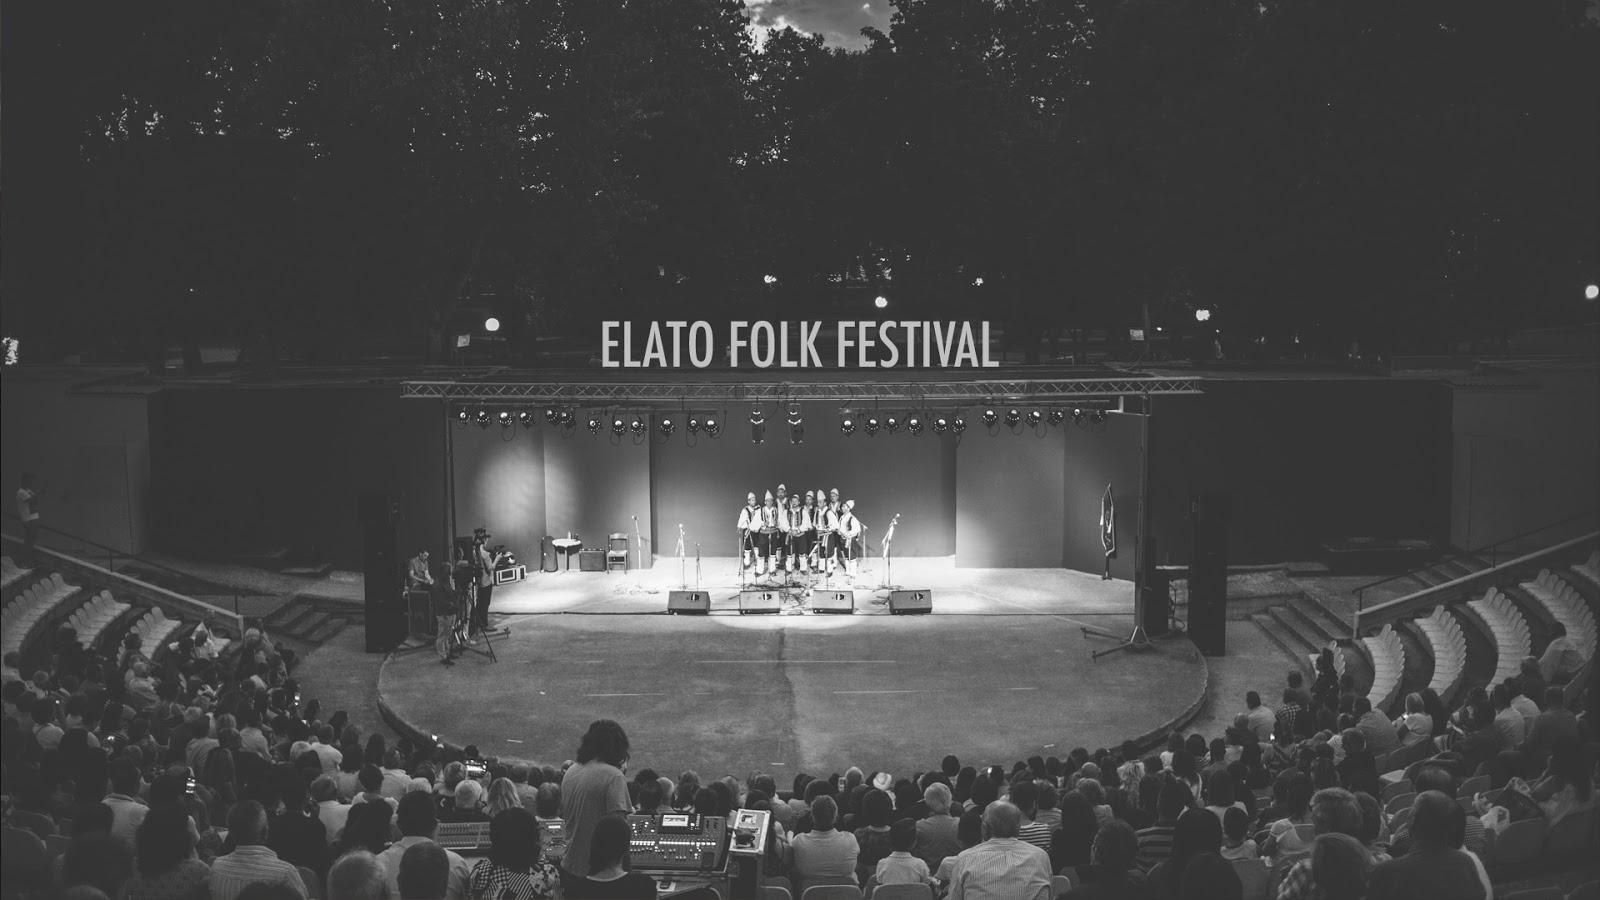 Elato Folk Festival 2016